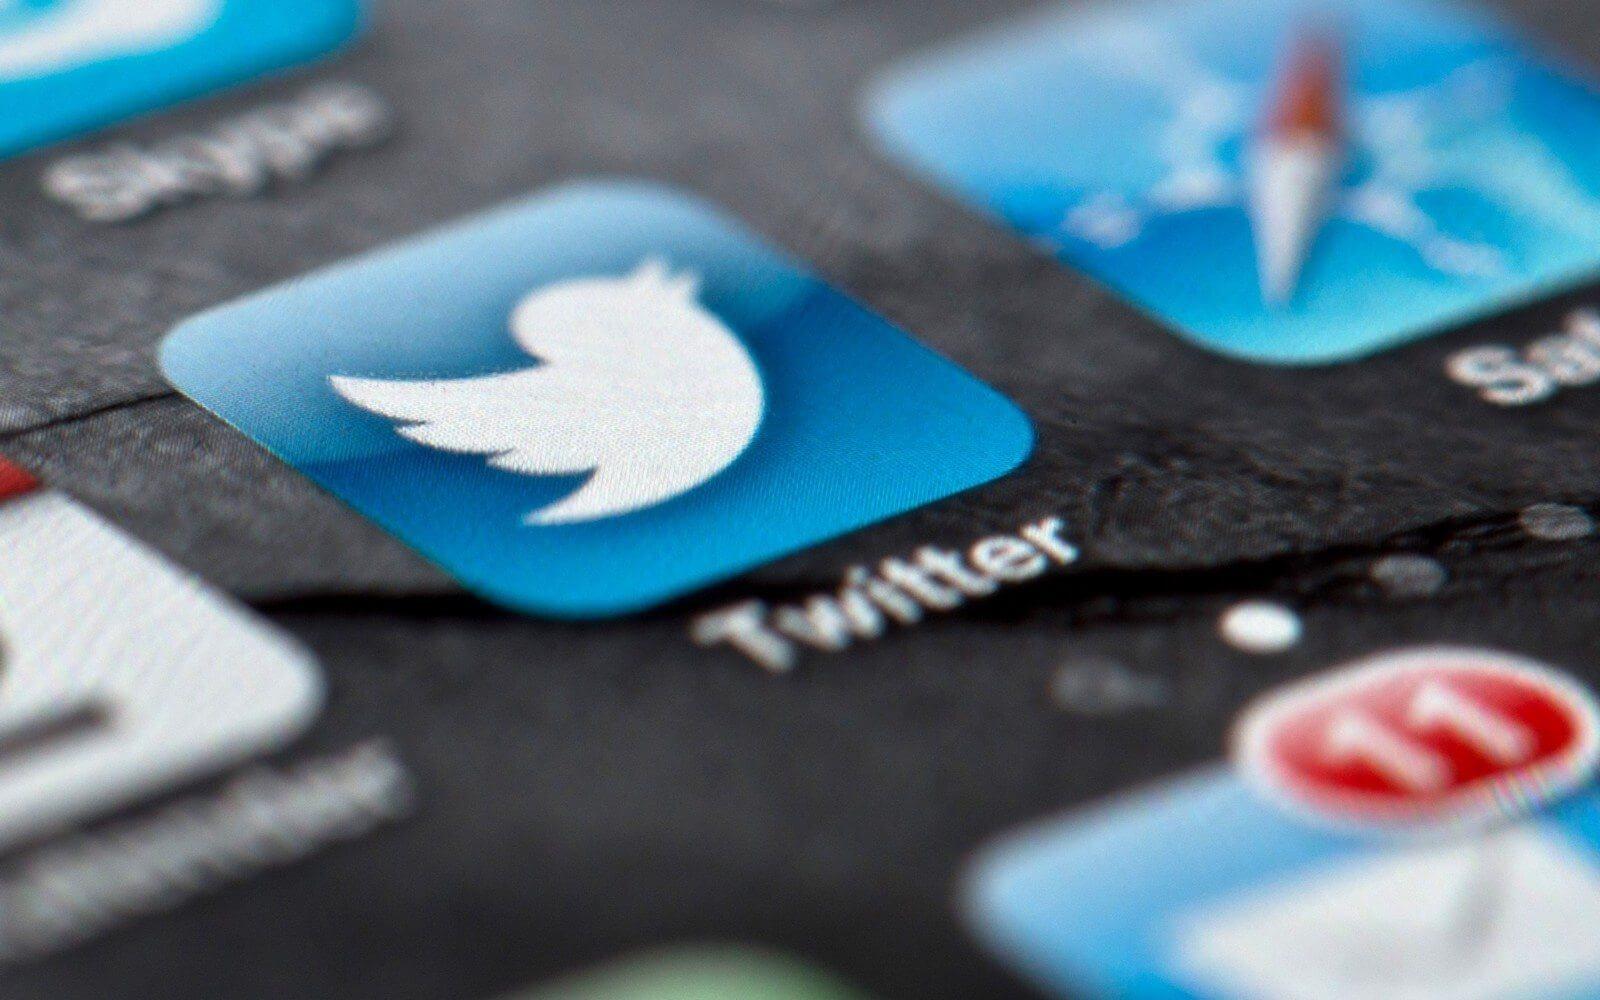 smt twitter p1 - Twitter testa novas reações usando emojis